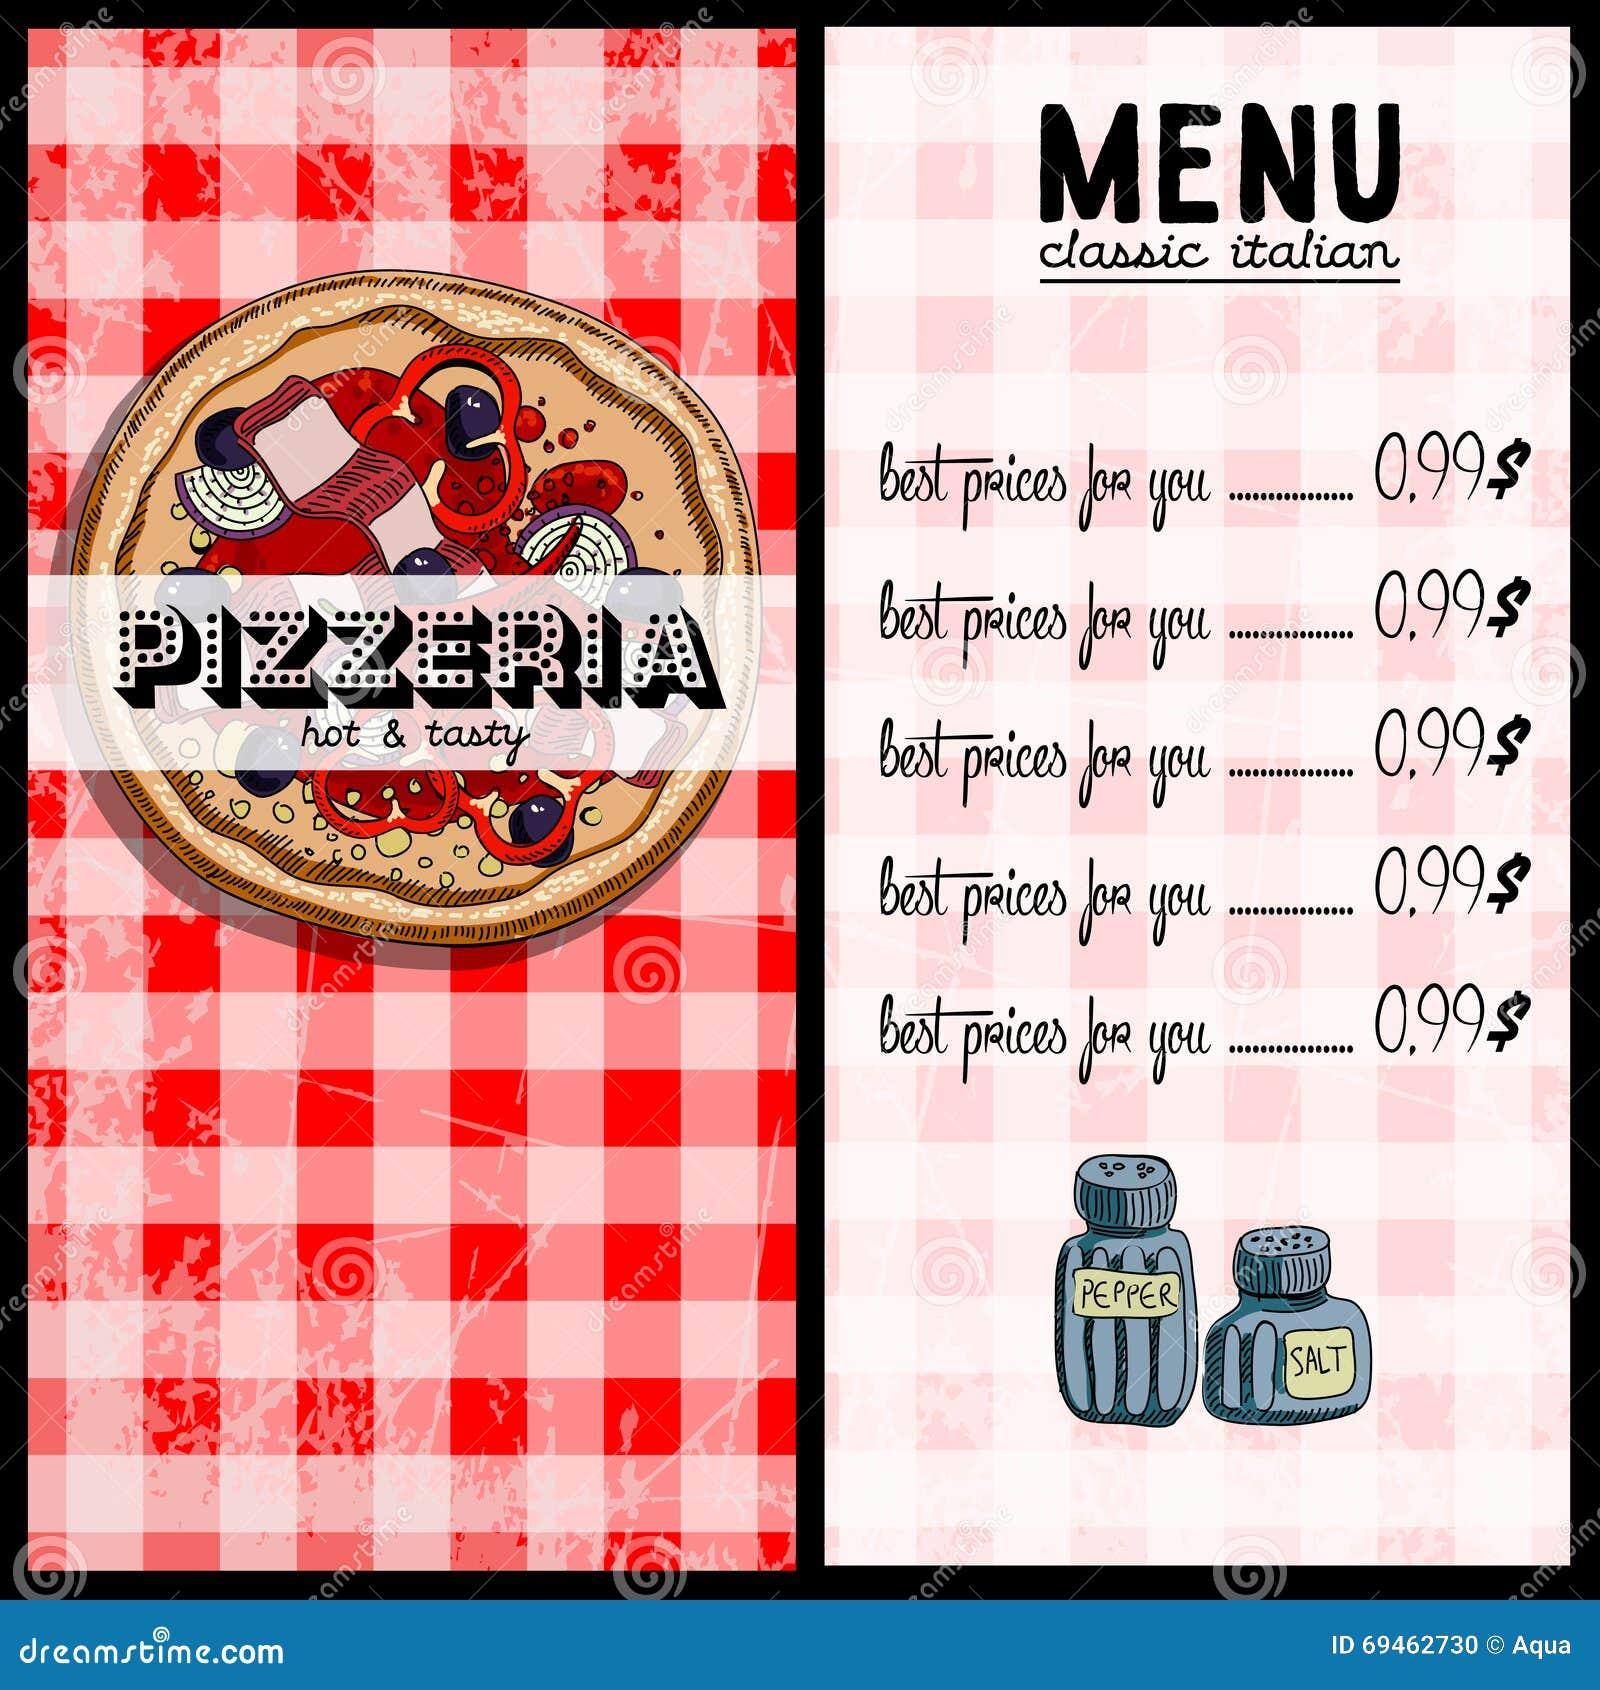 Sample Pizza Menu Templates